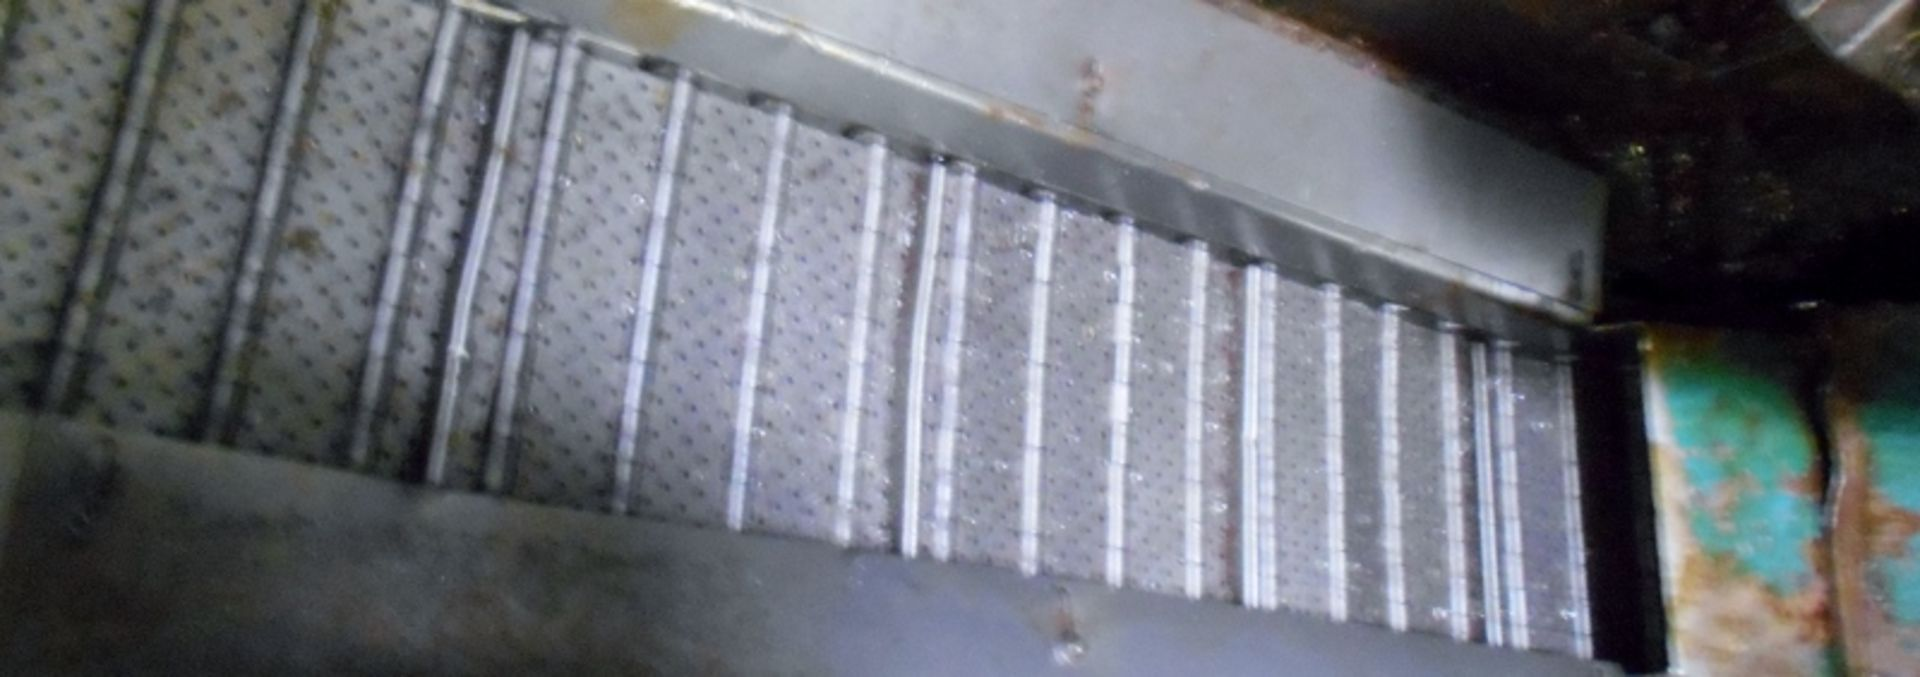 Lot 12 - Turbo 6287-8002 Incline Chip Conveyor Serial #306595